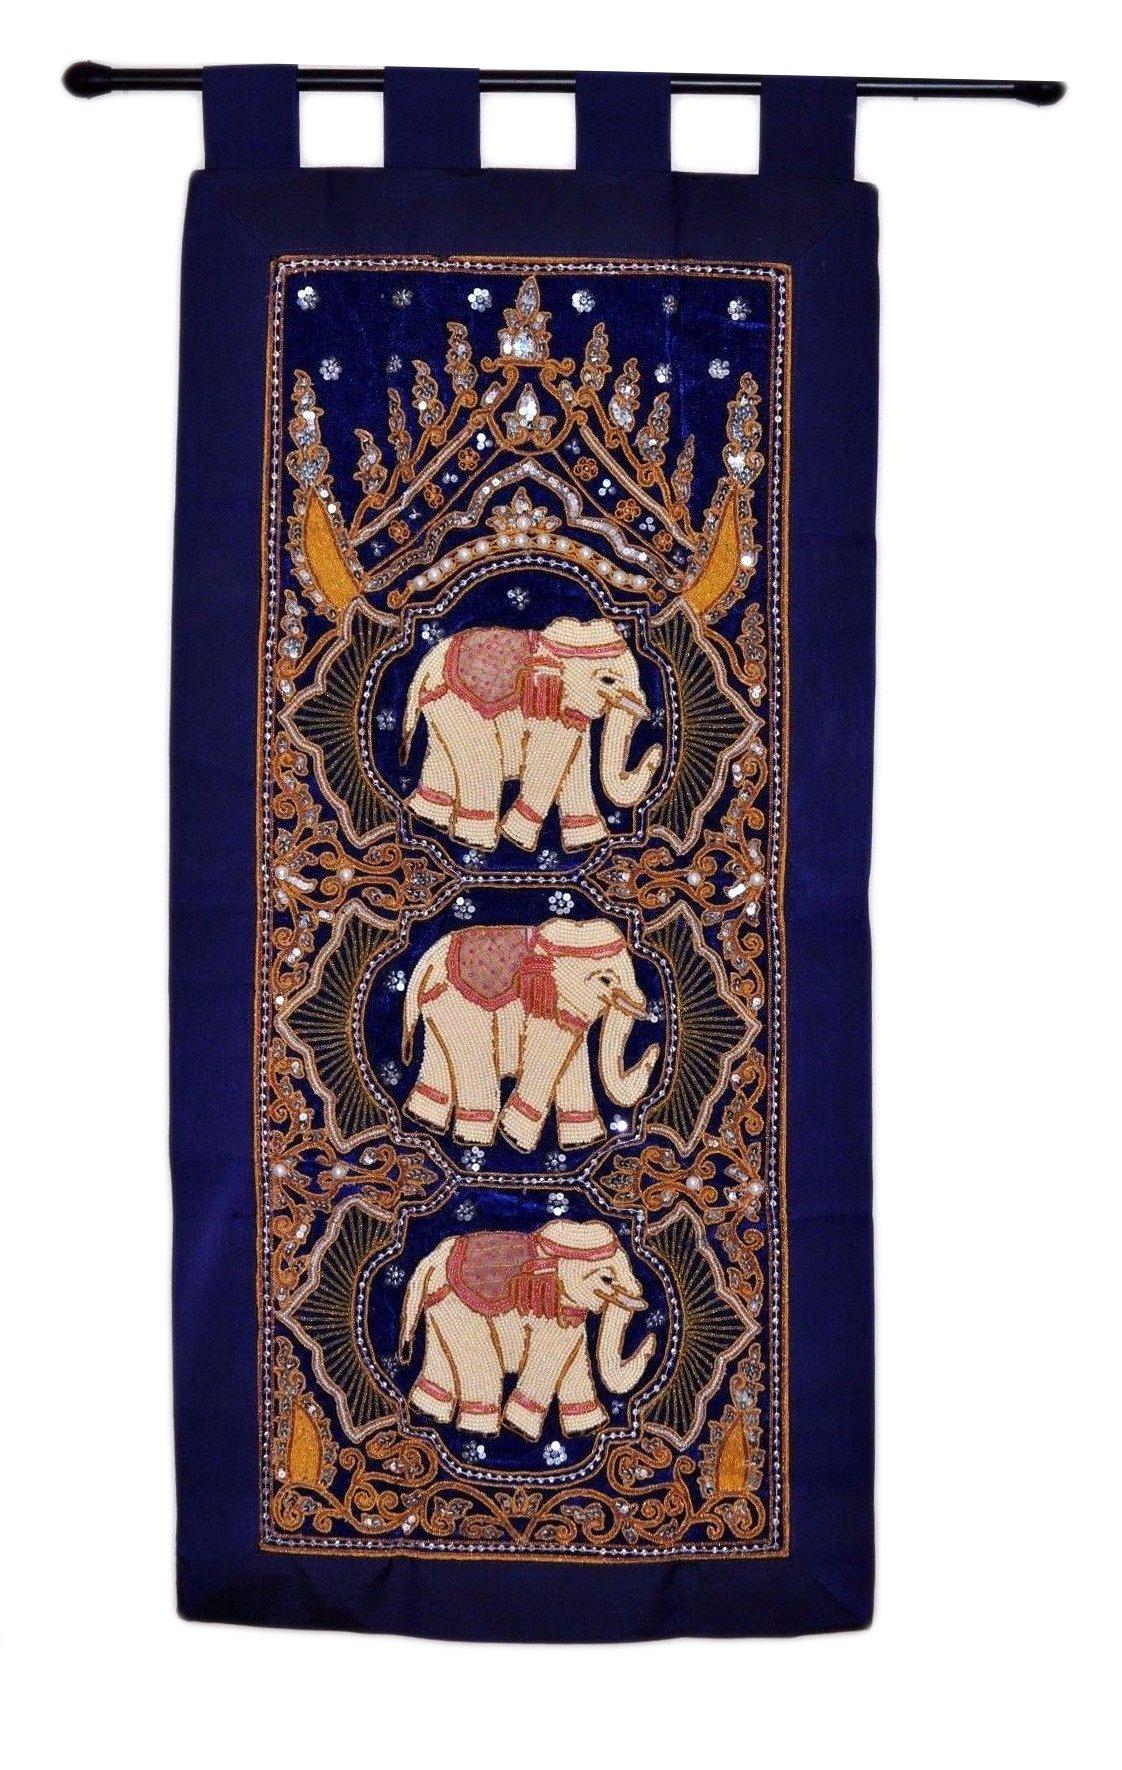 kalaga wall hanging-thai wall decor-burma wall hanging 3 elephant- Tapestries - Blue Decoration USA Seller by Decorinhome